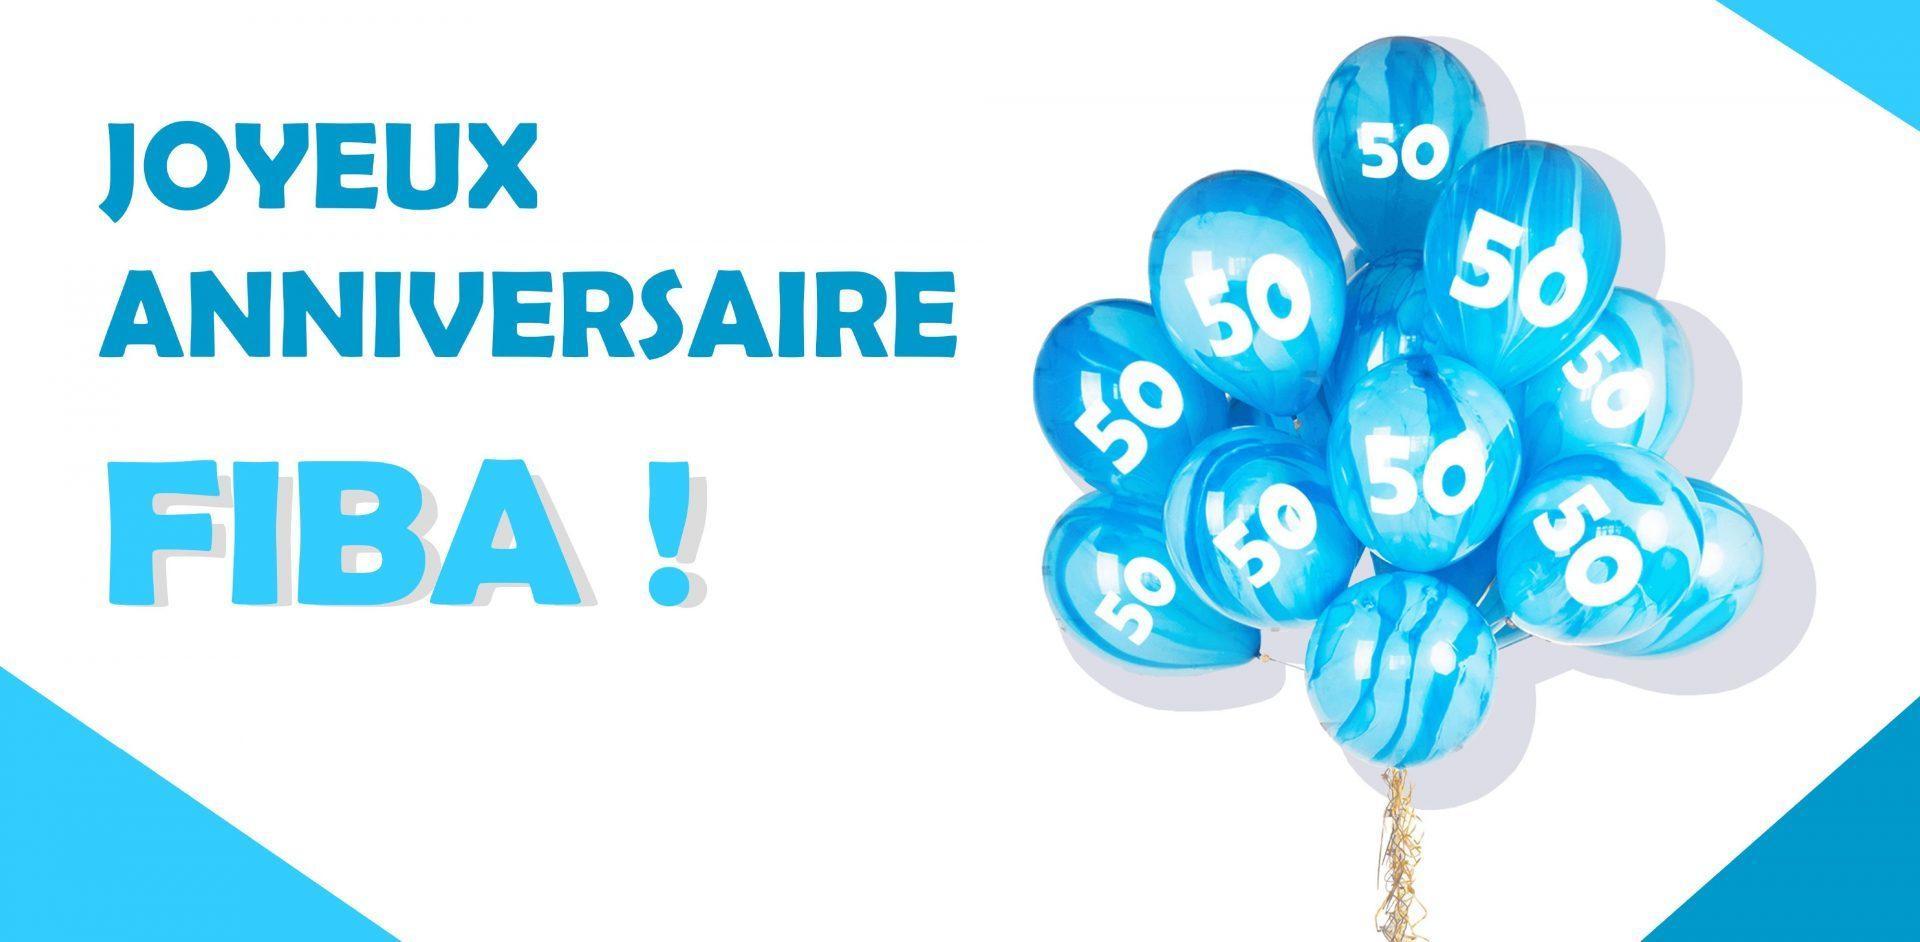 FIBA fête ses 50 ans